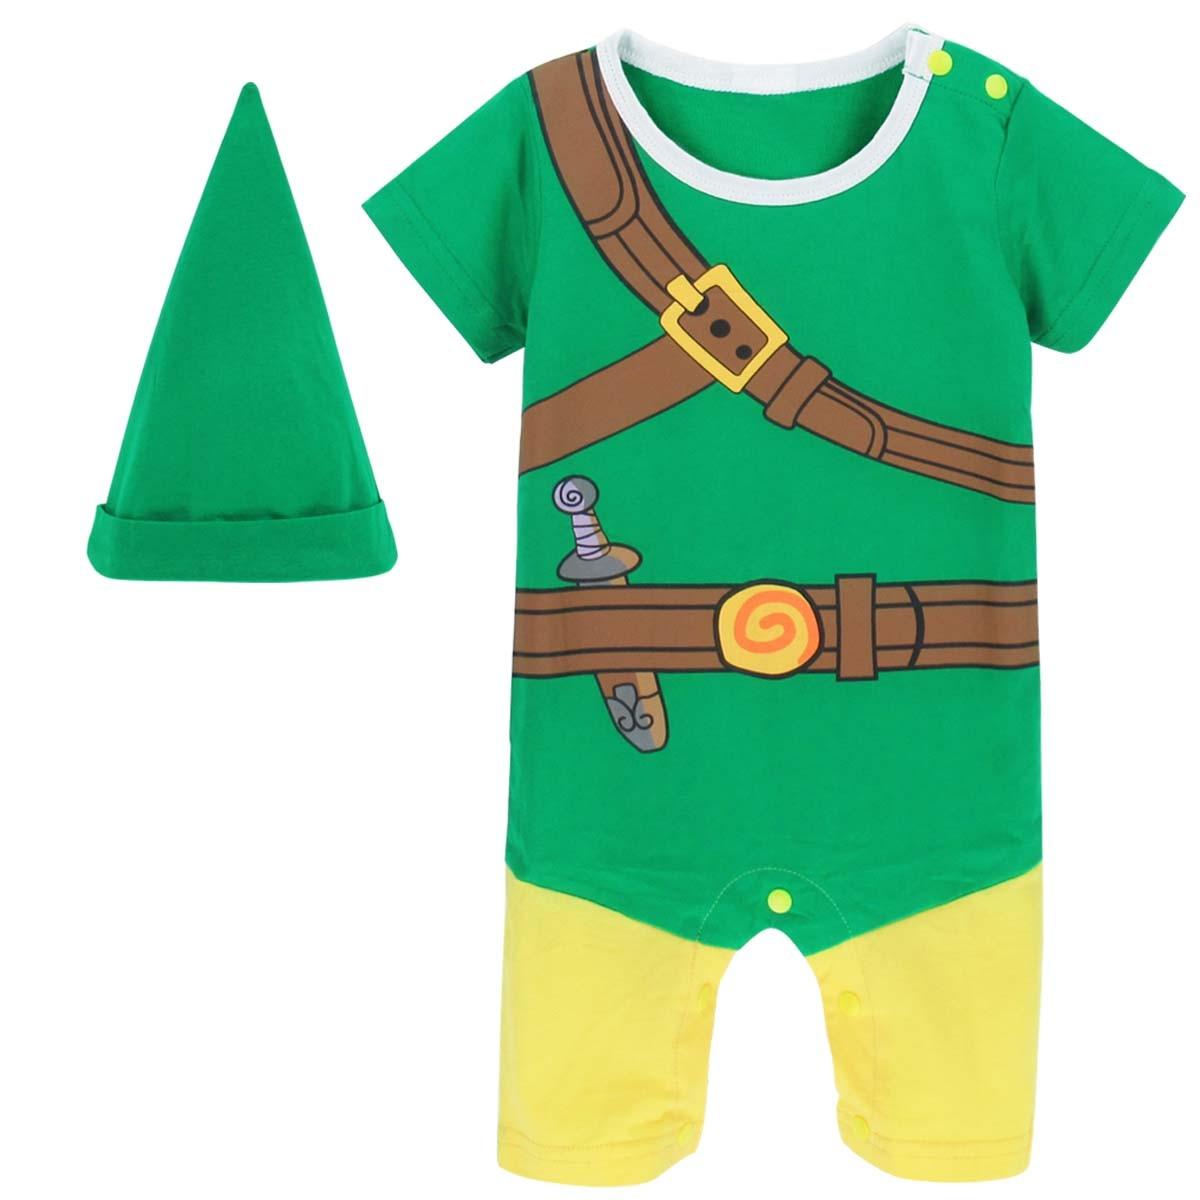 Jumpsuit Romper Pajamas Christmas s Gift Babygrows Brand 1273 Funny Novelty Babygrow